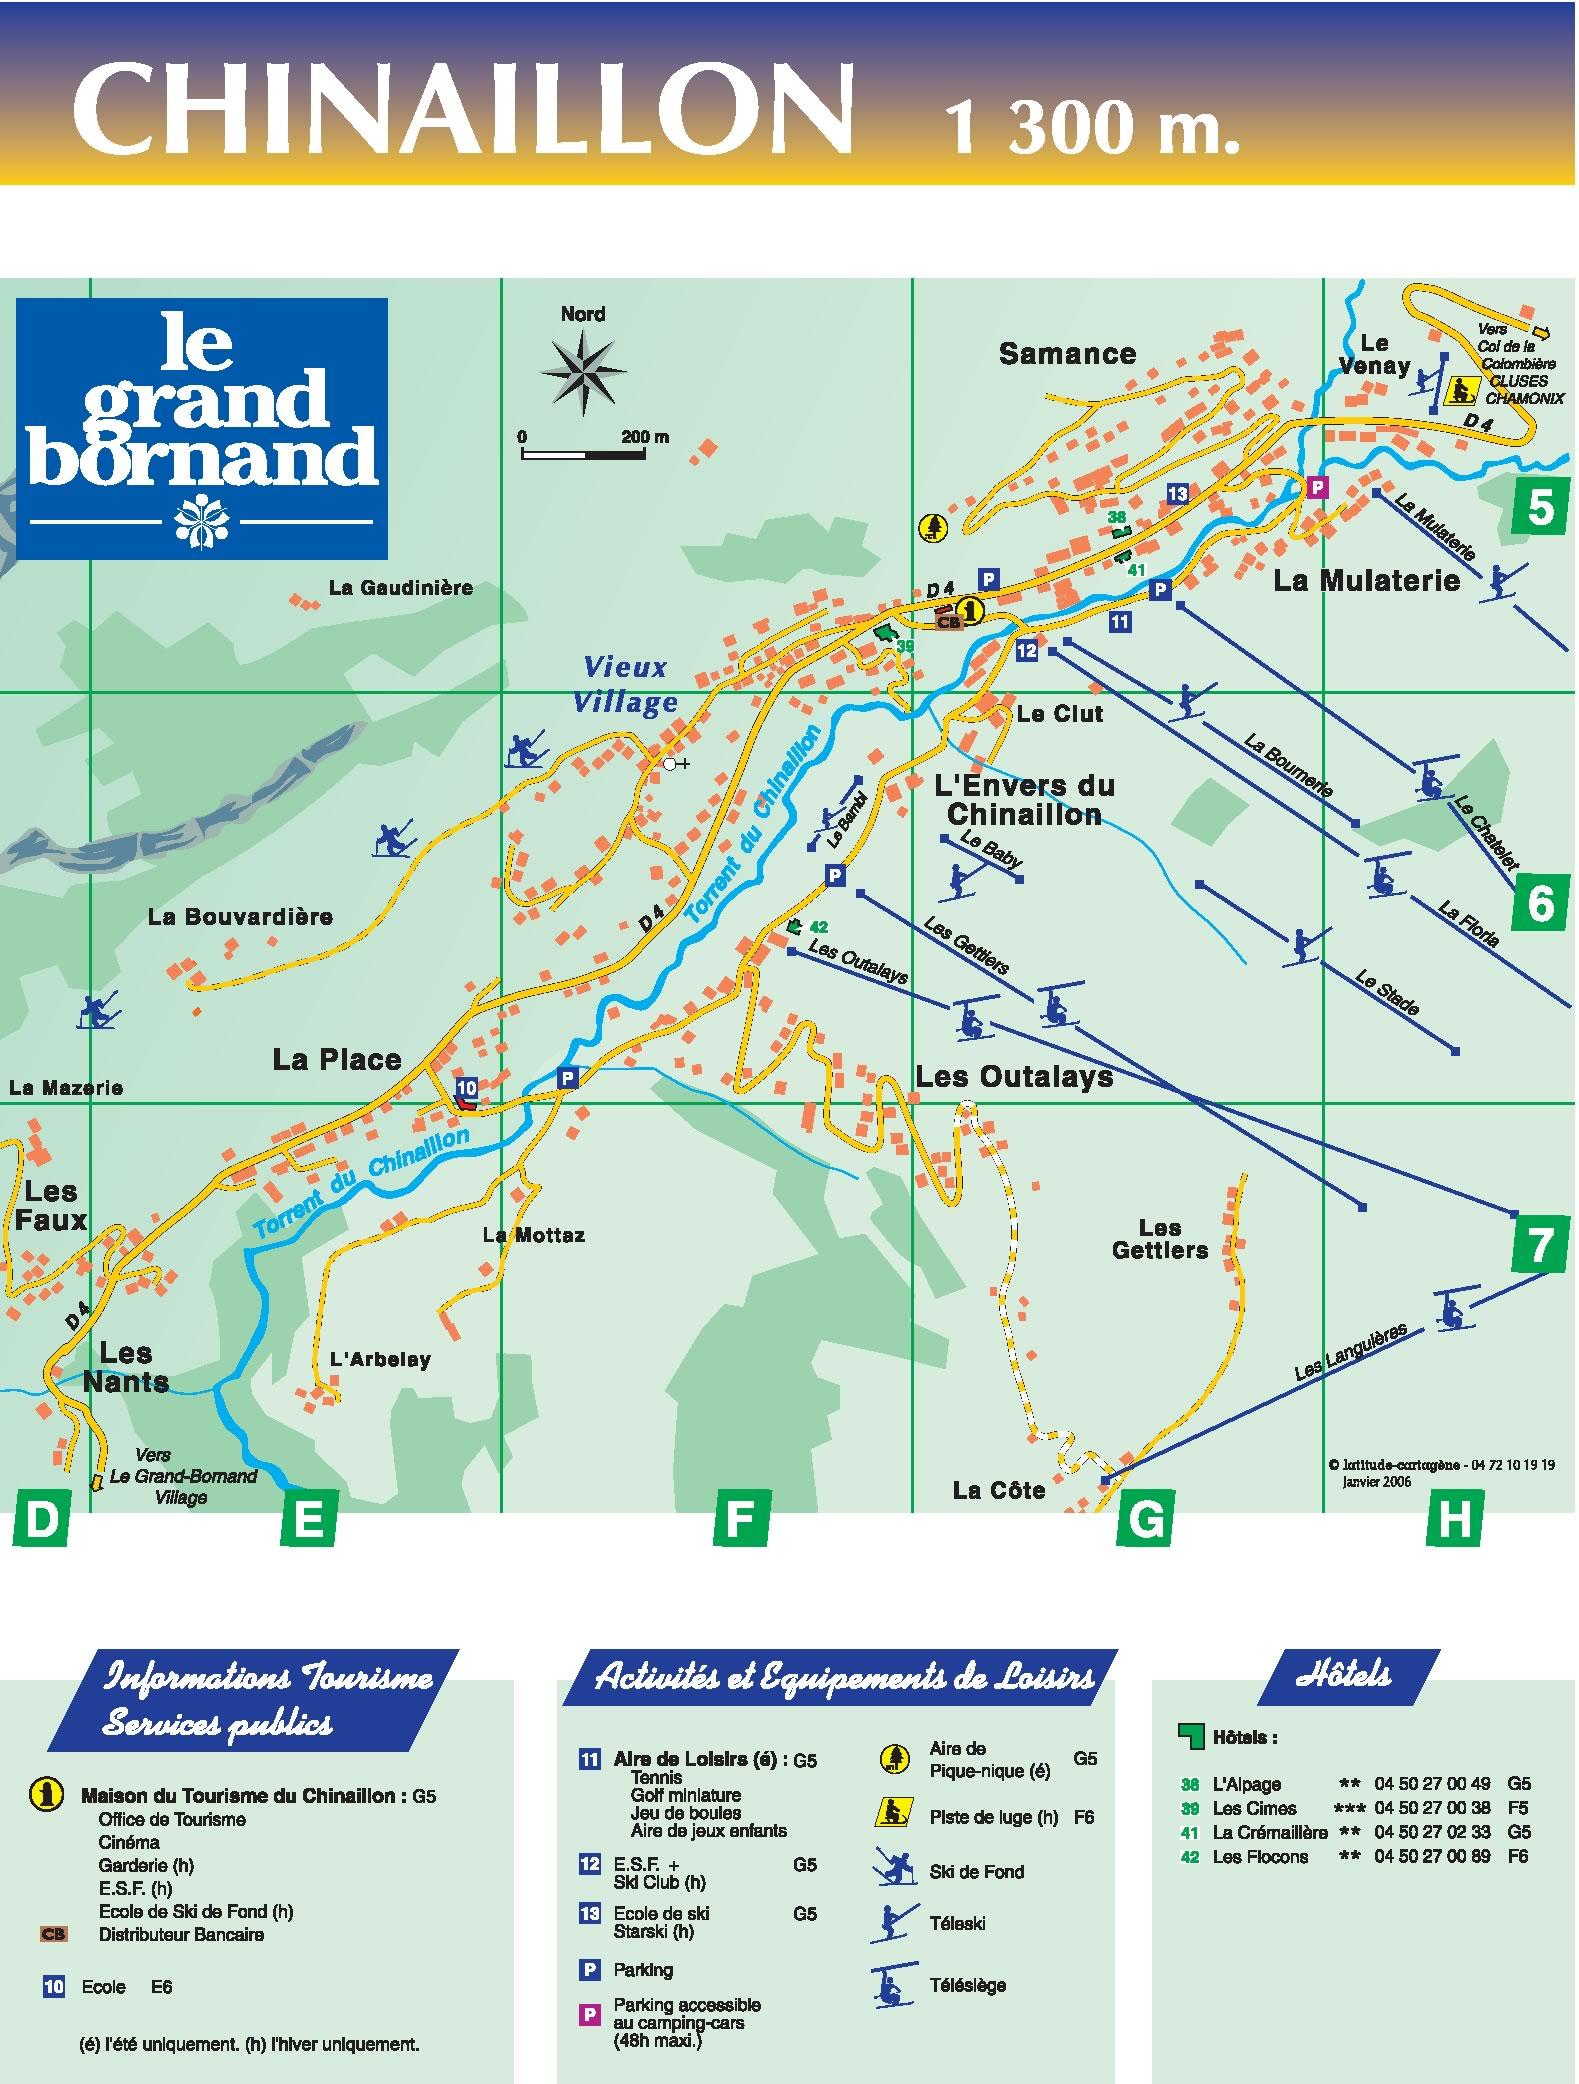 Plan d'accès Le Grand Bornand